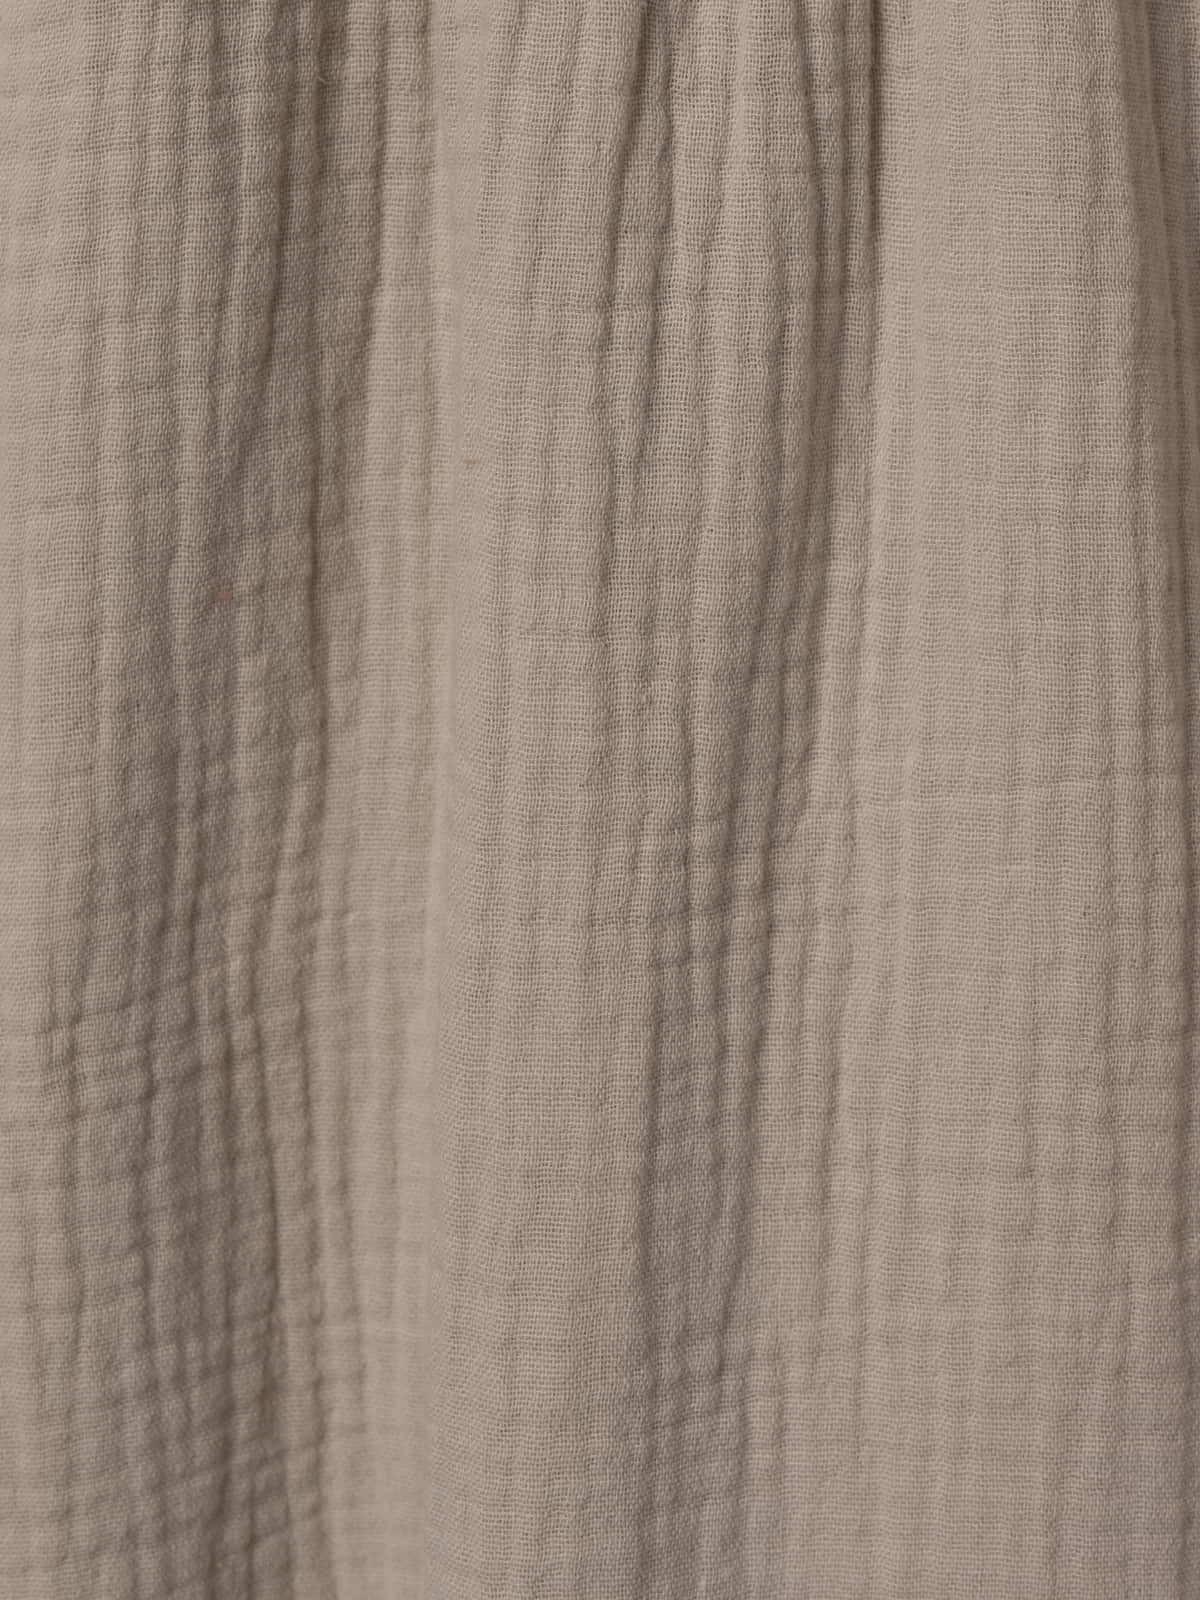 Top algodón tirante ajustable Beige